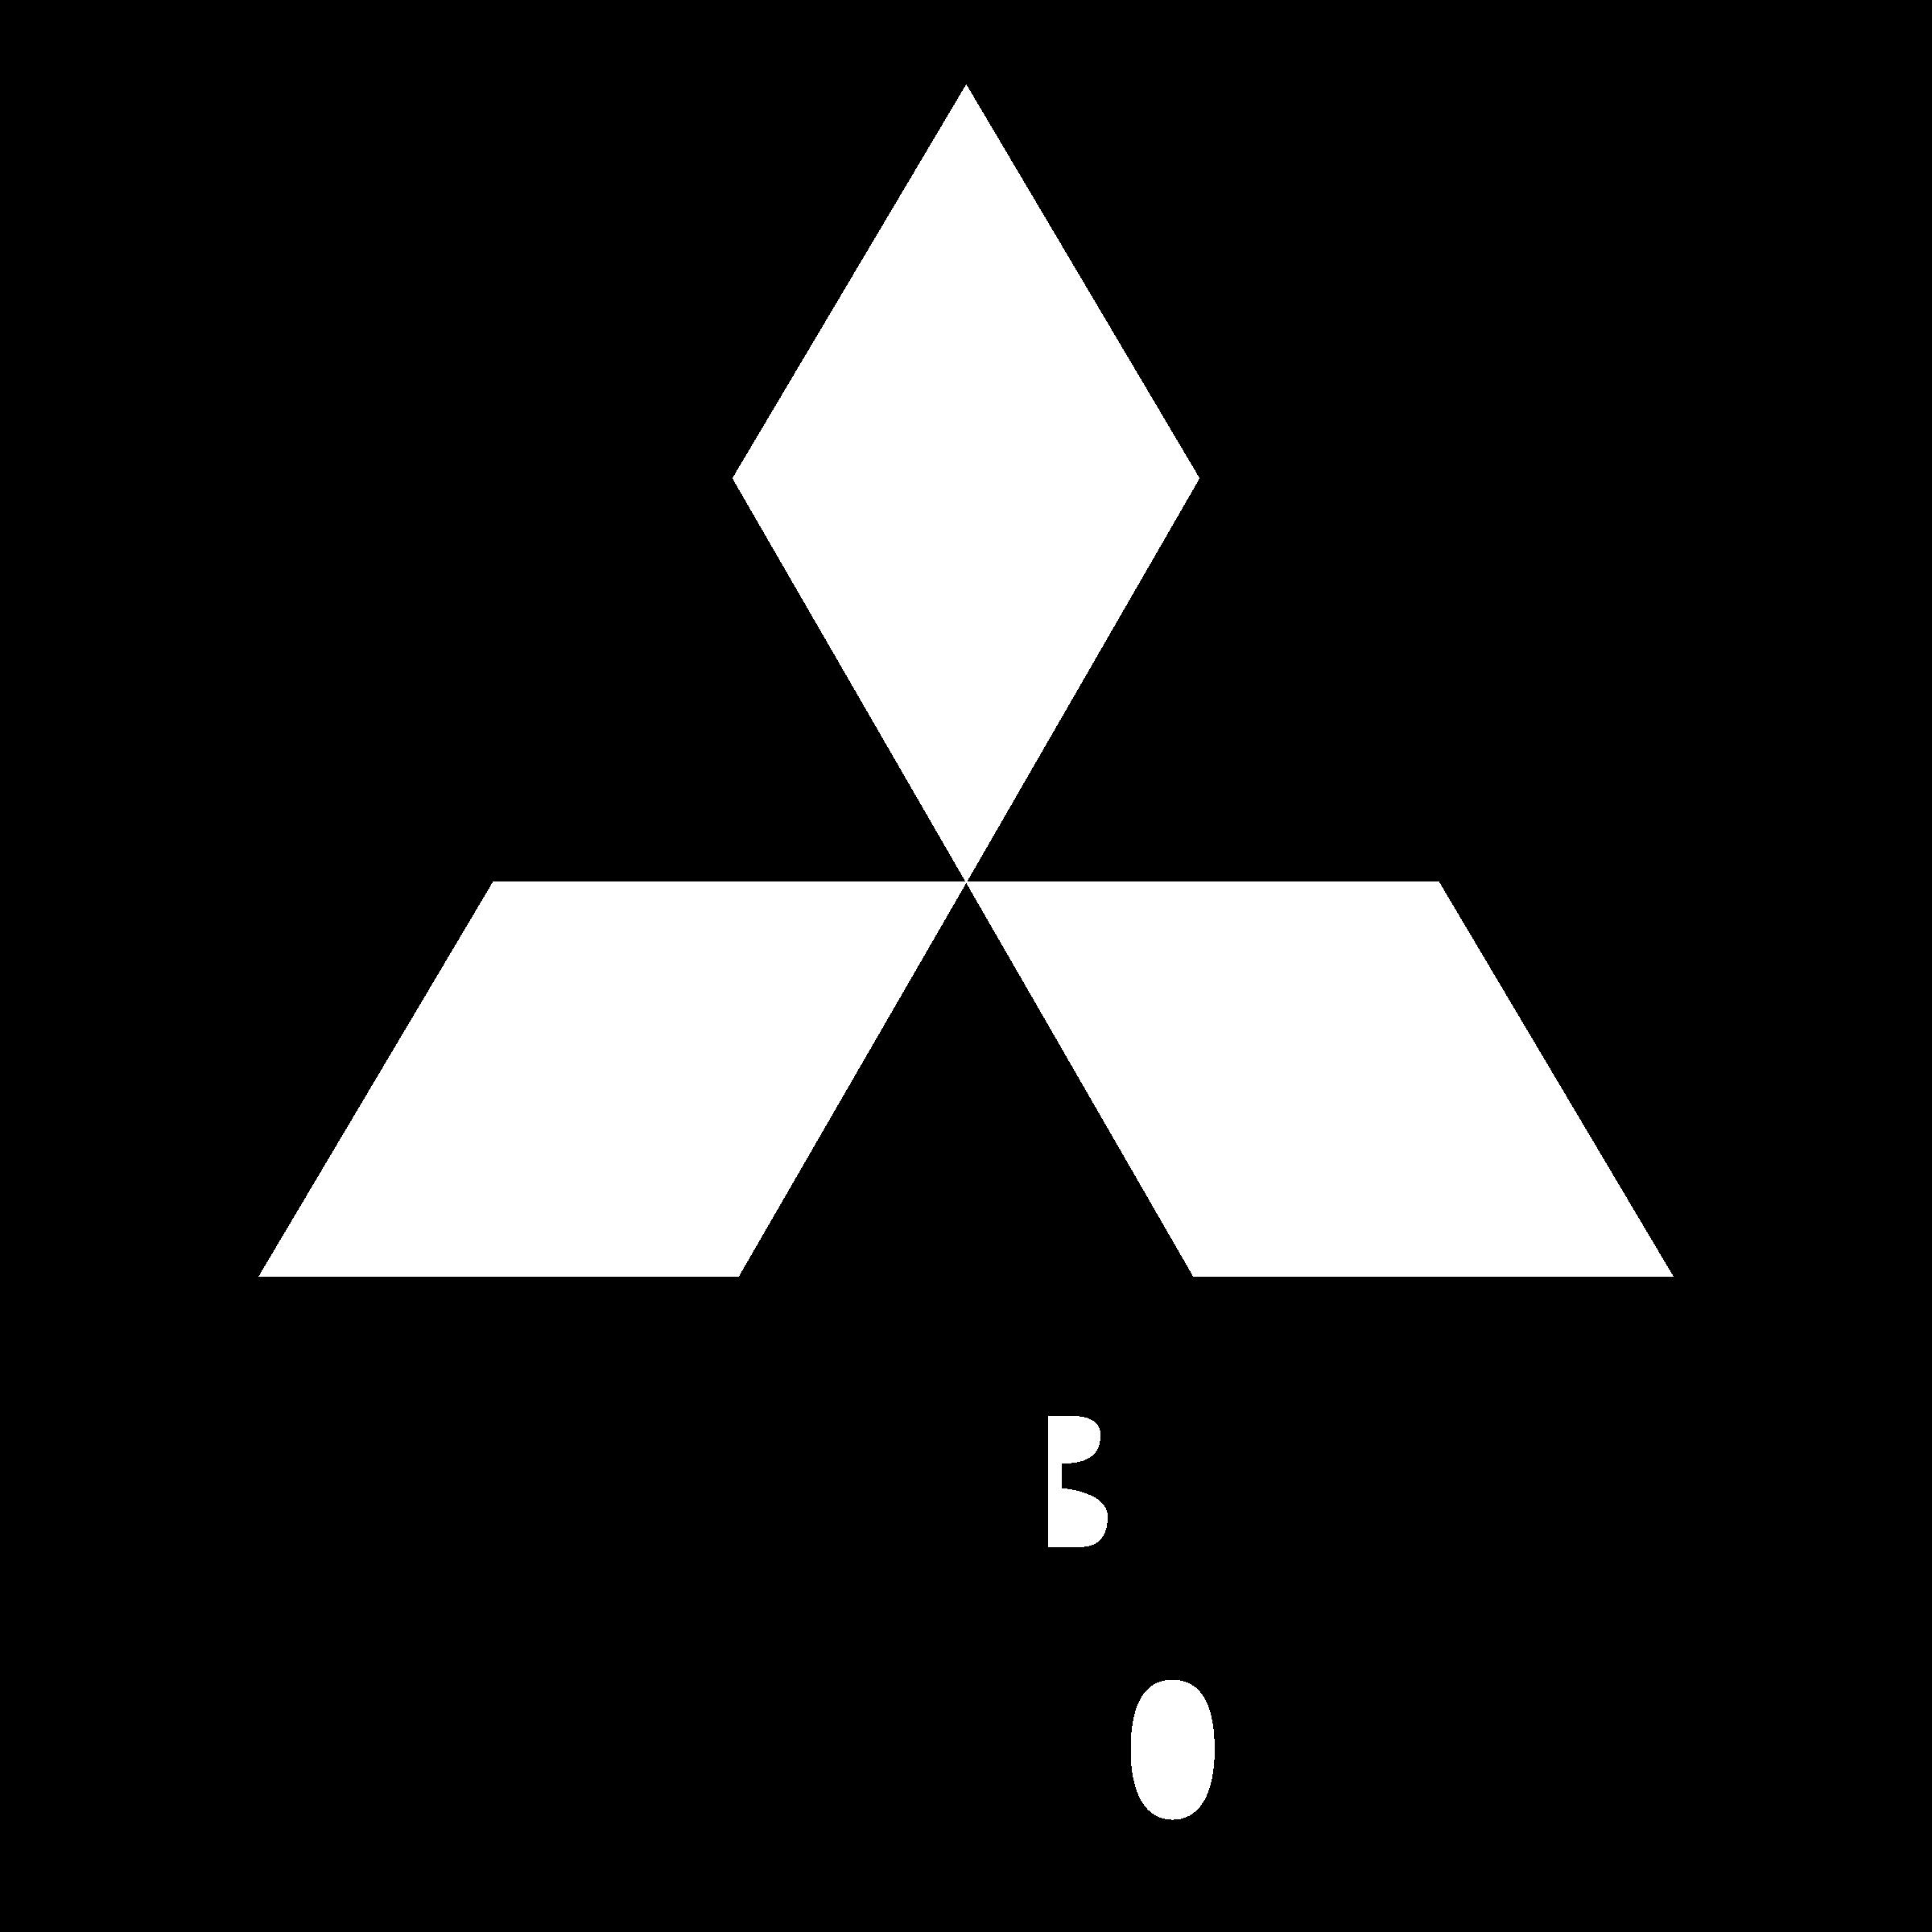 mitsubishi fuso logo png transparent amp svg vector